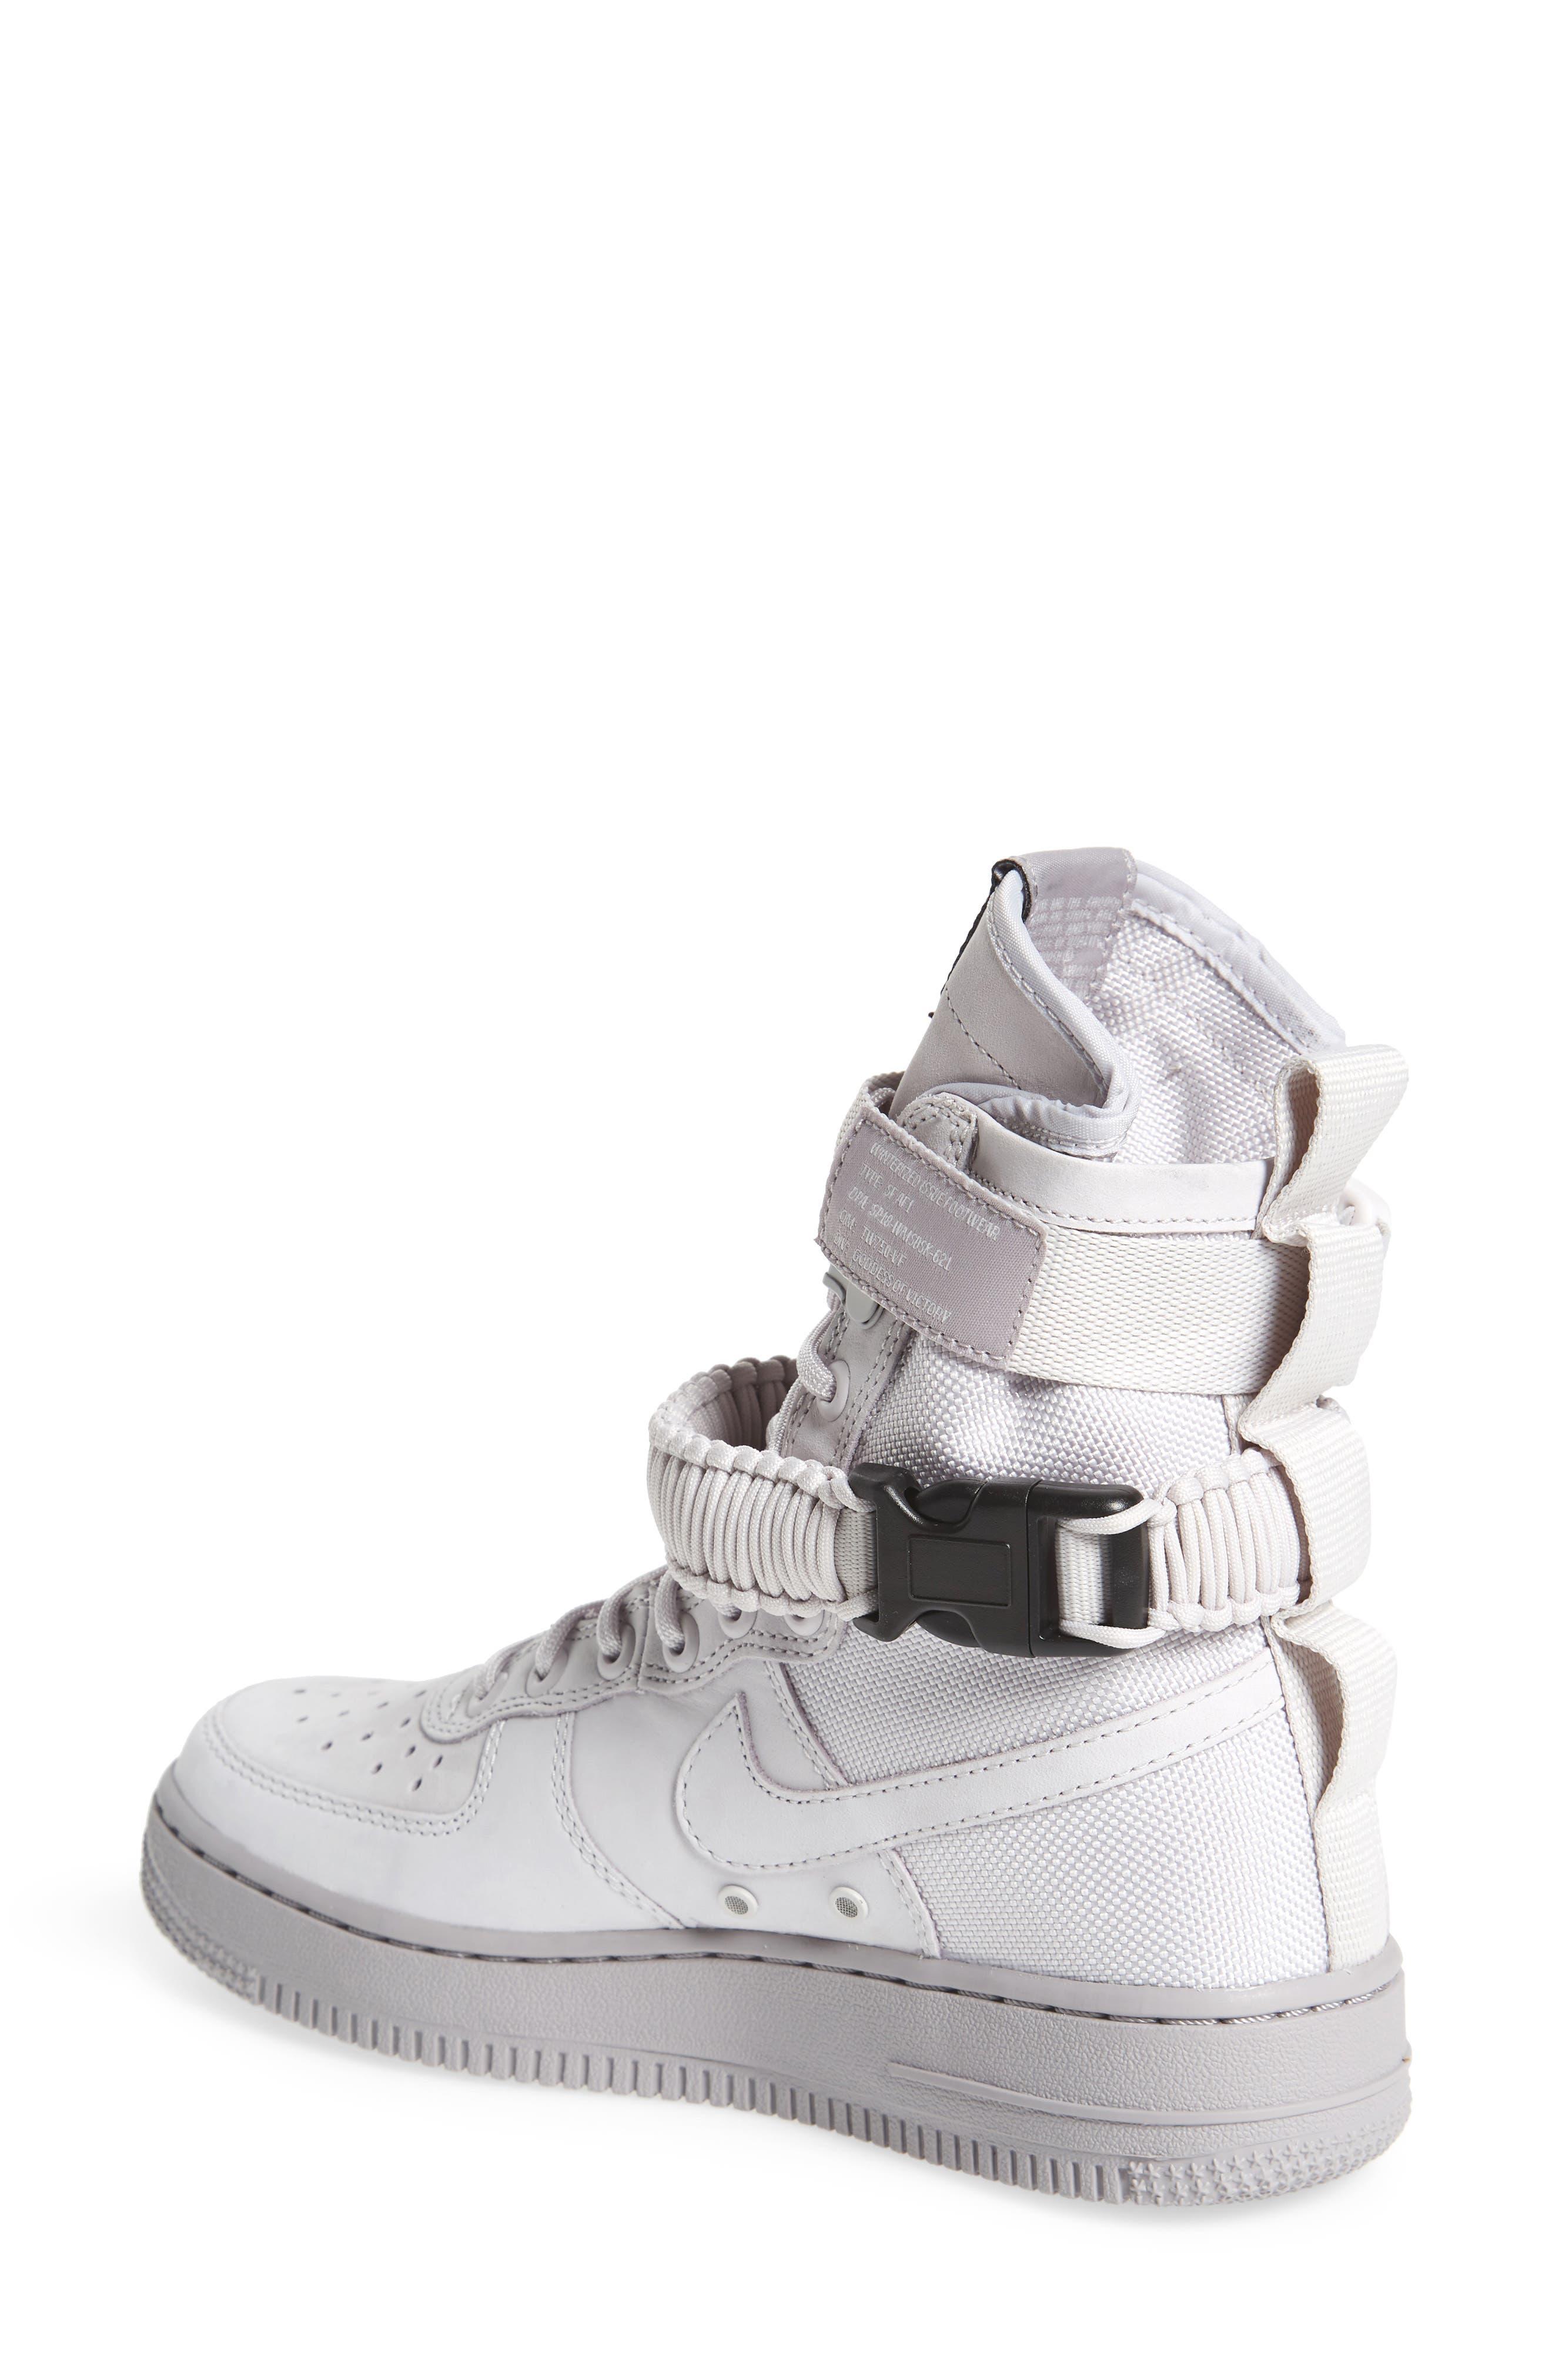 SF Air Force 1 High Top Sneaker,                             Alternate thumbnail 2, color,                             Vast Grey/ Vast Grey